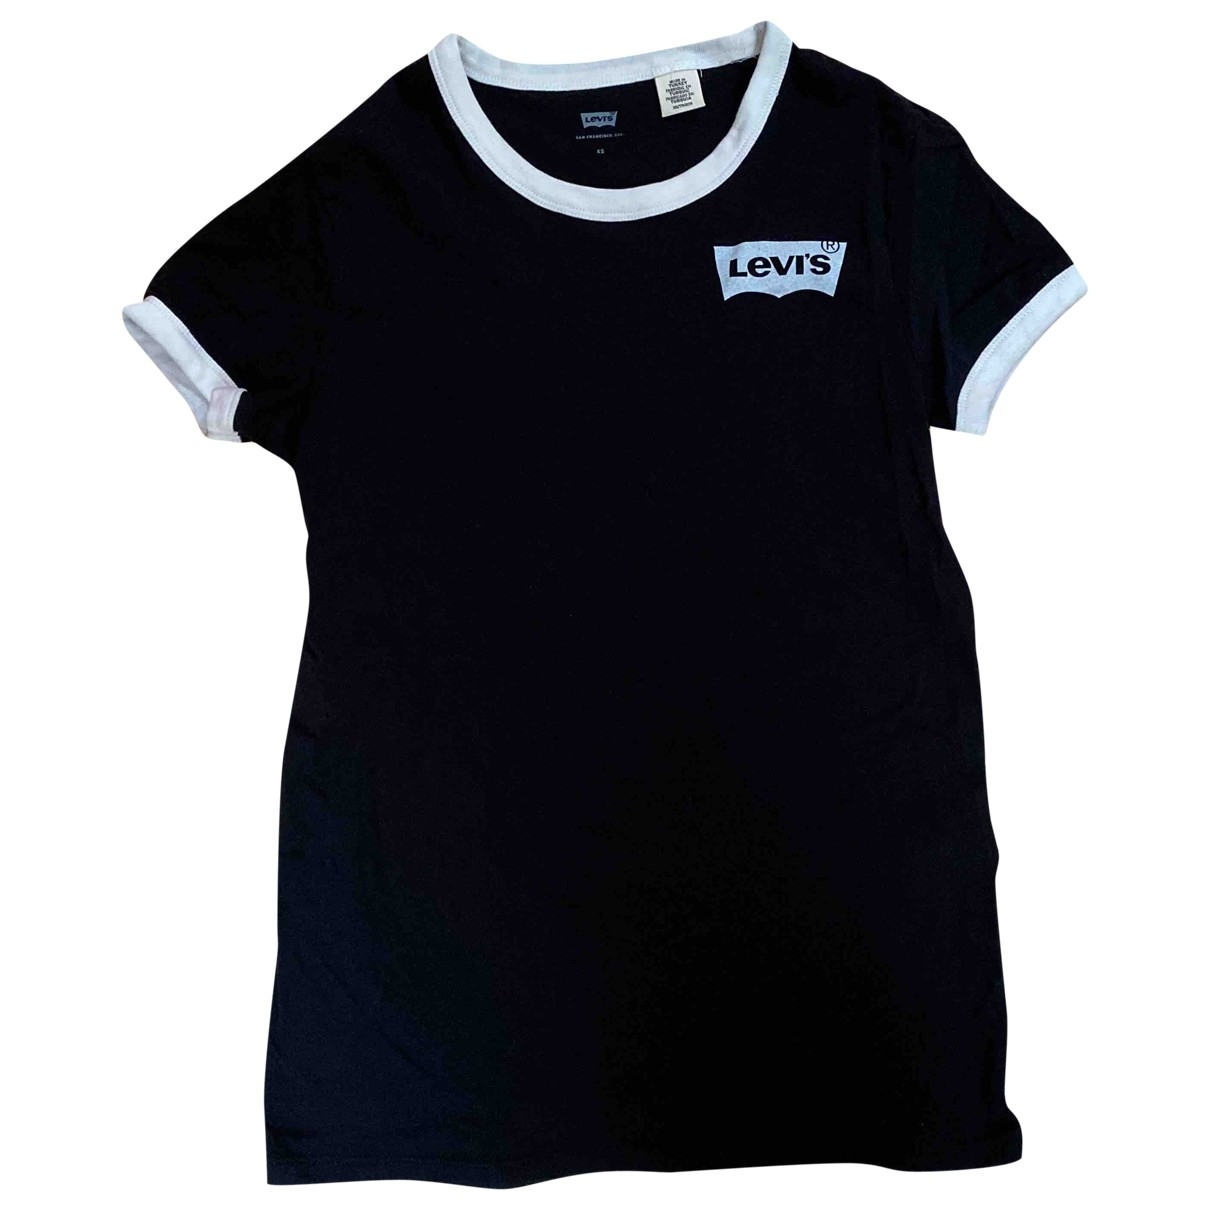 Levi's \N Black Cotton  top for Women XS International